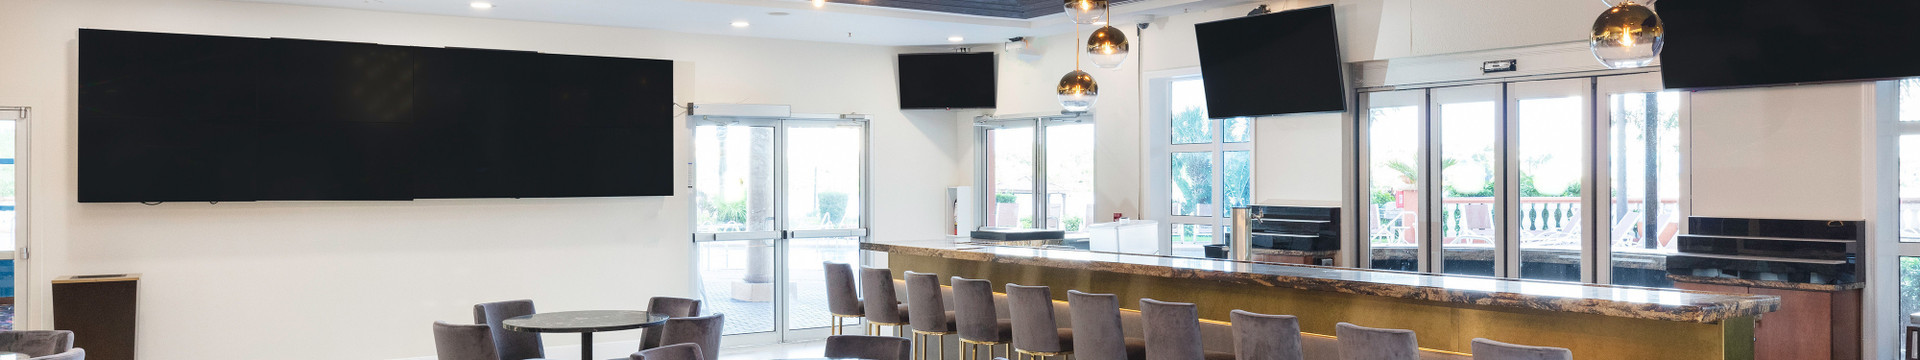 Drafts Sports Bar & Grill Express in Orlando, FL 32819 | Sports Bars Near International Drive | Westgate Palace Resort